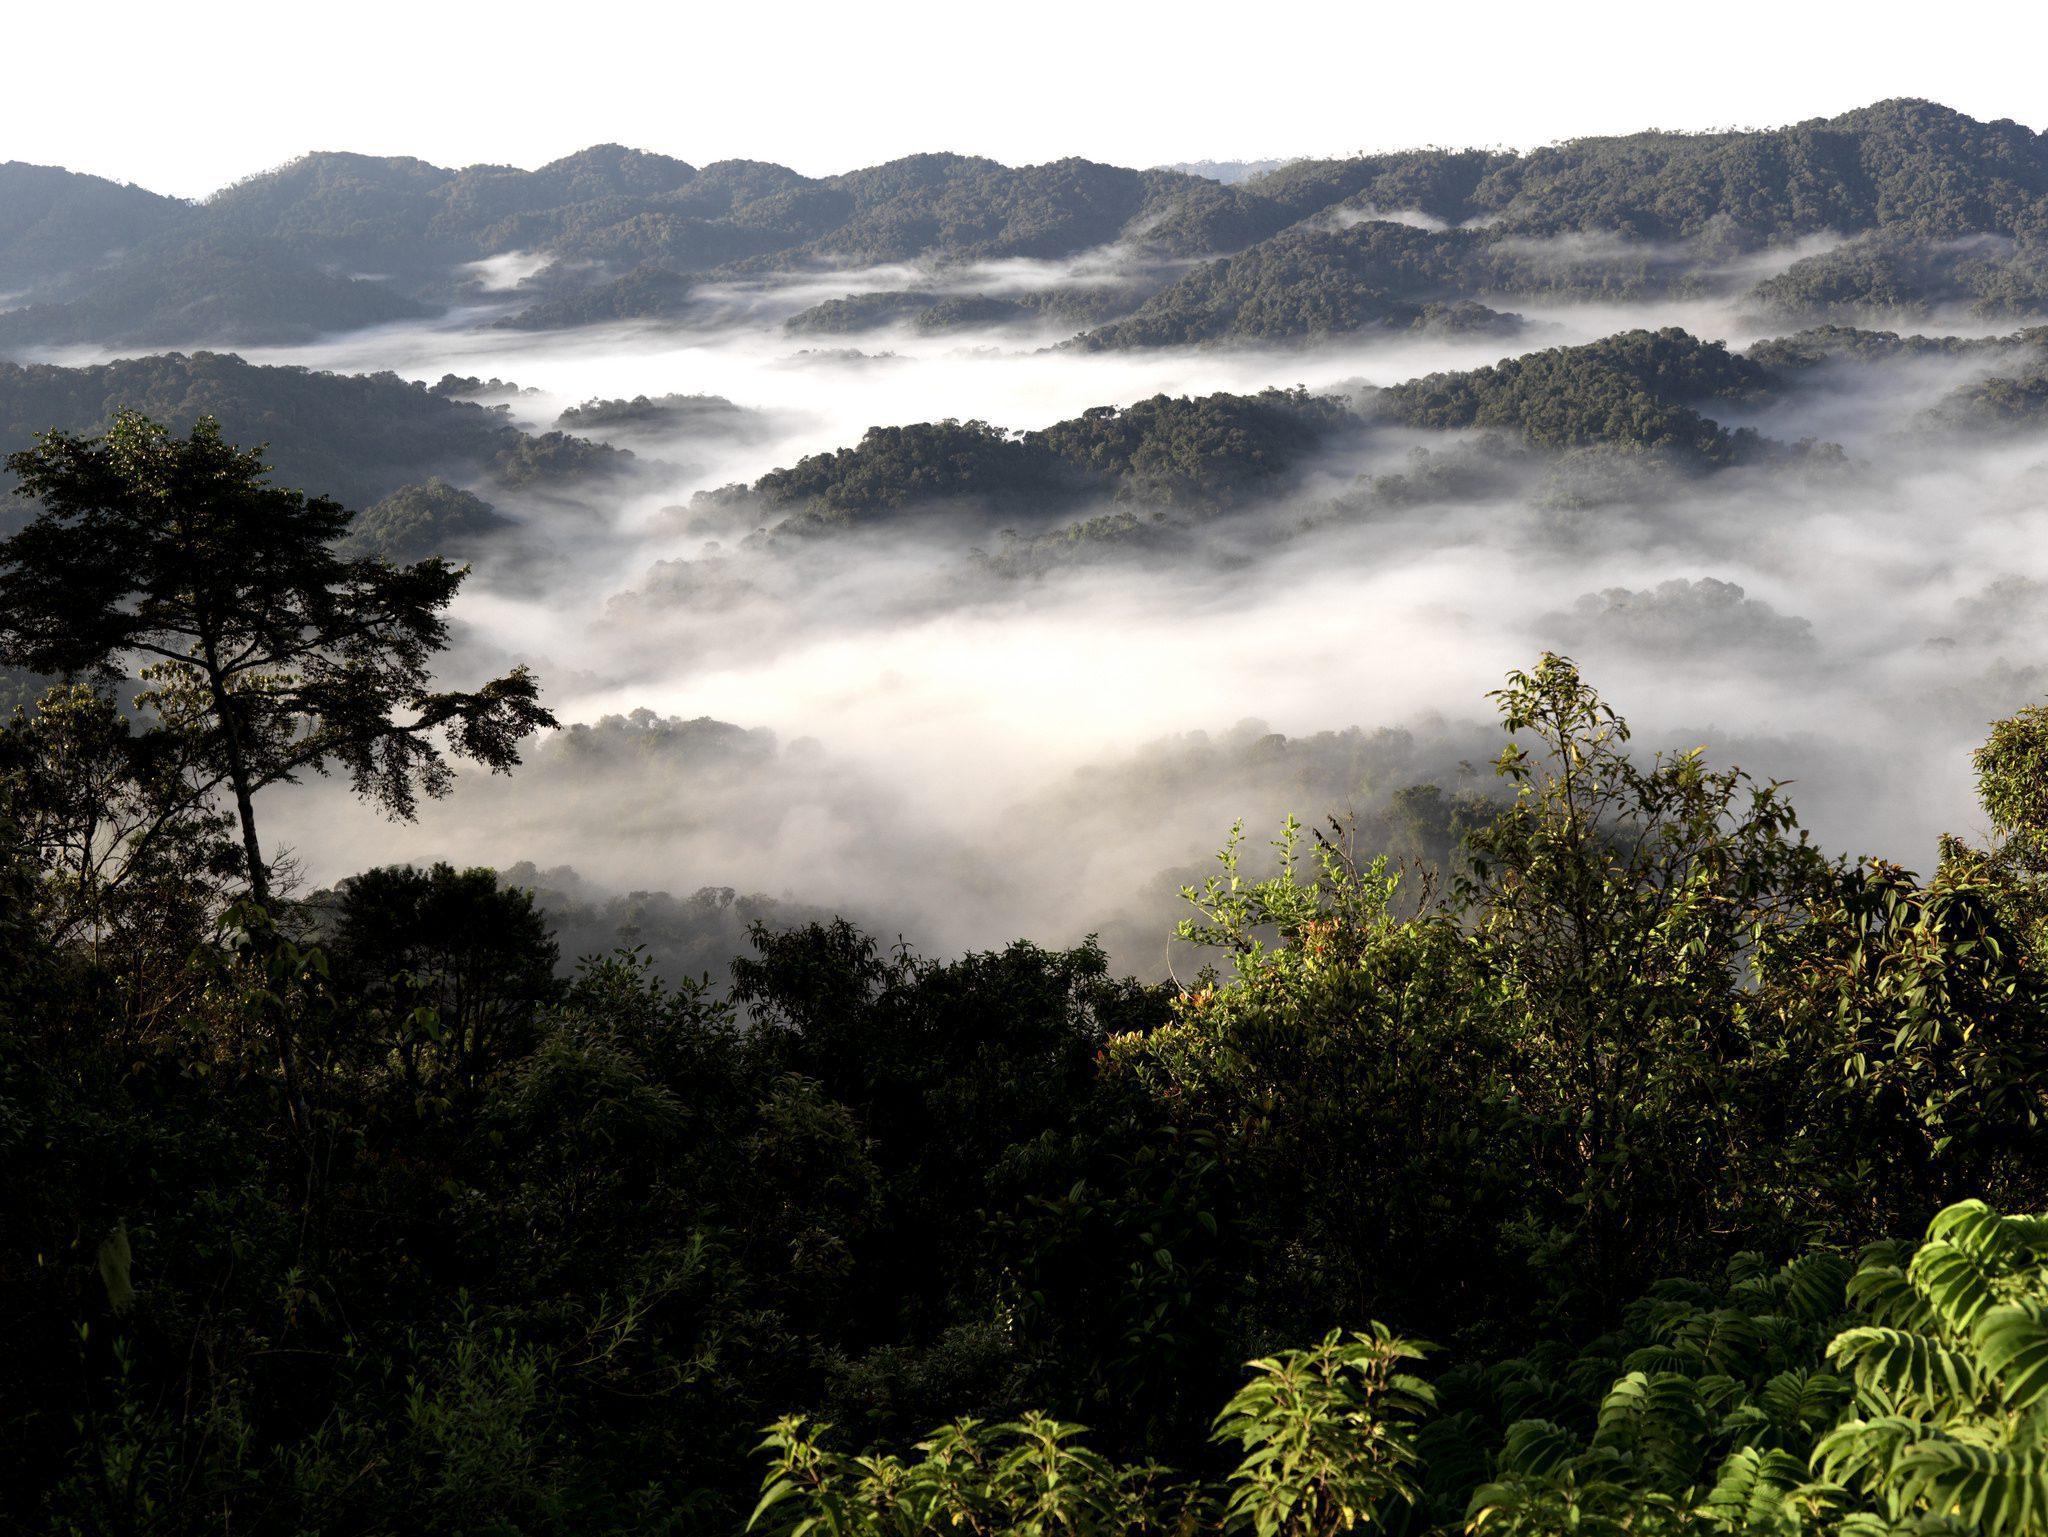 Nyungwe landscape with mist over trees seen on Rwanda safari